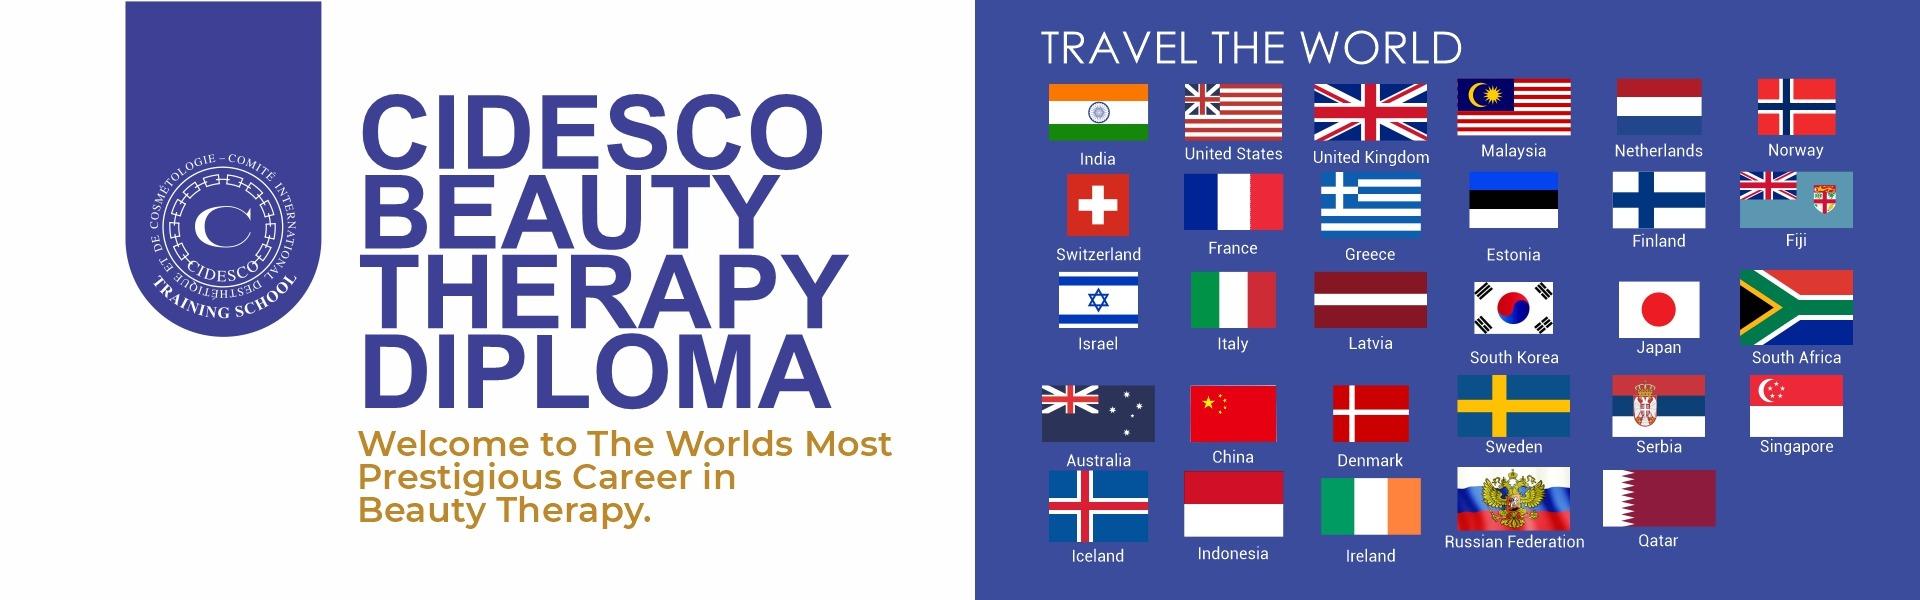 CIDESCO Beauty Therapy Diploma Course